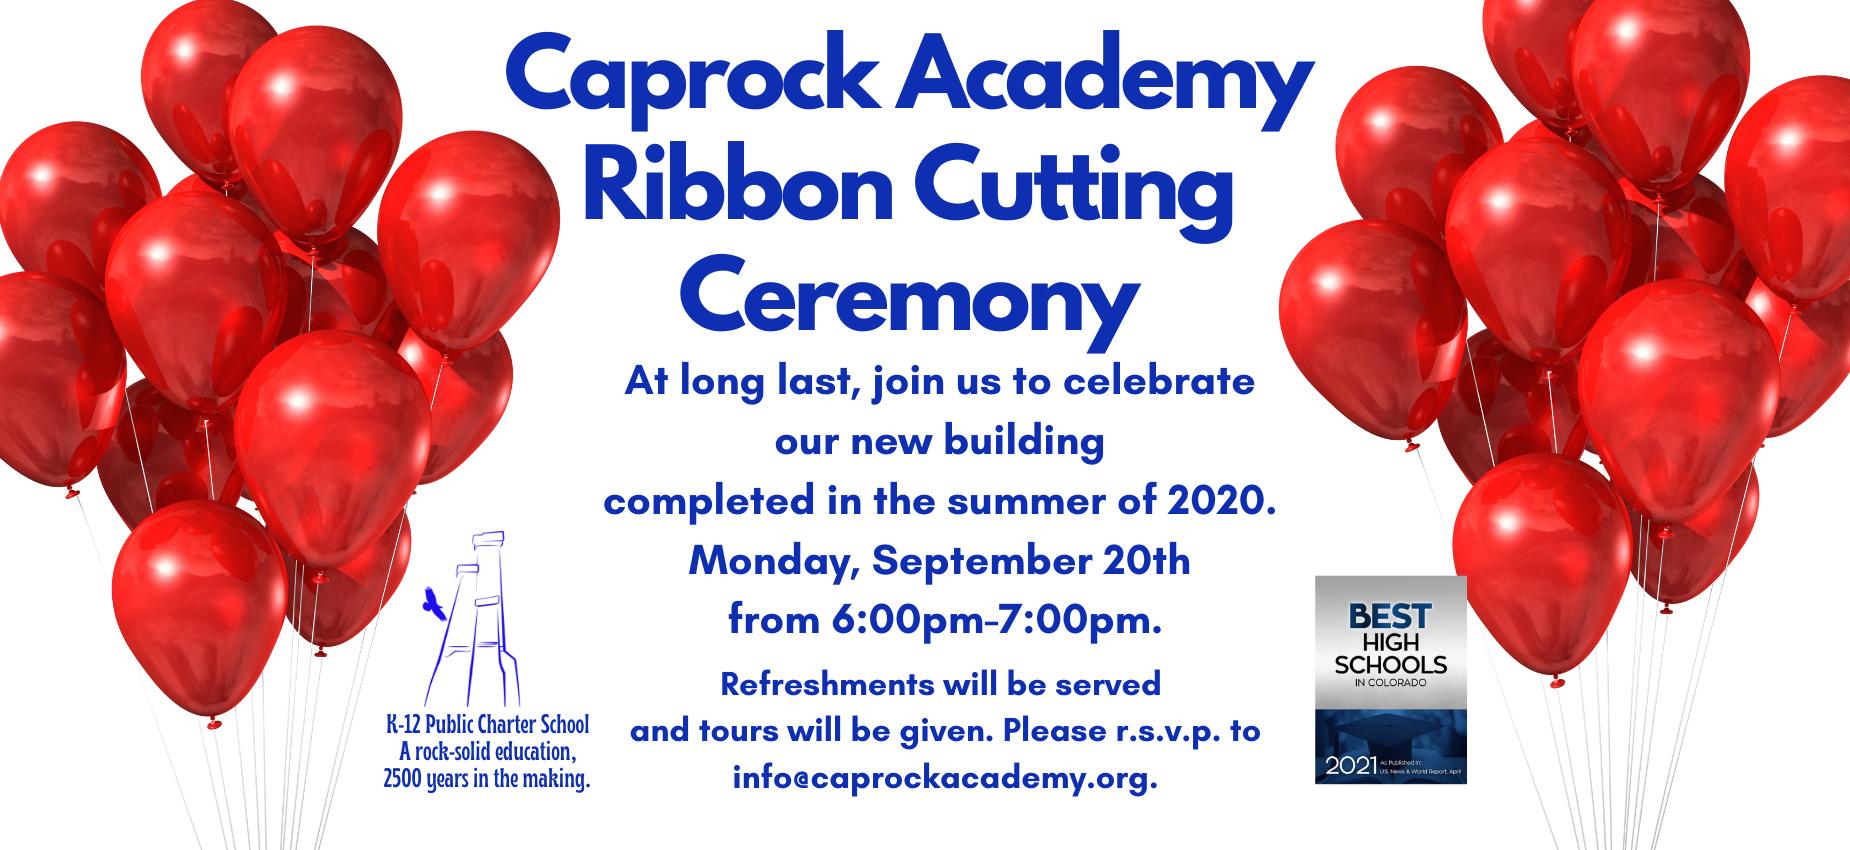 Ribbon Cutting ceremony Monday Sept 20th